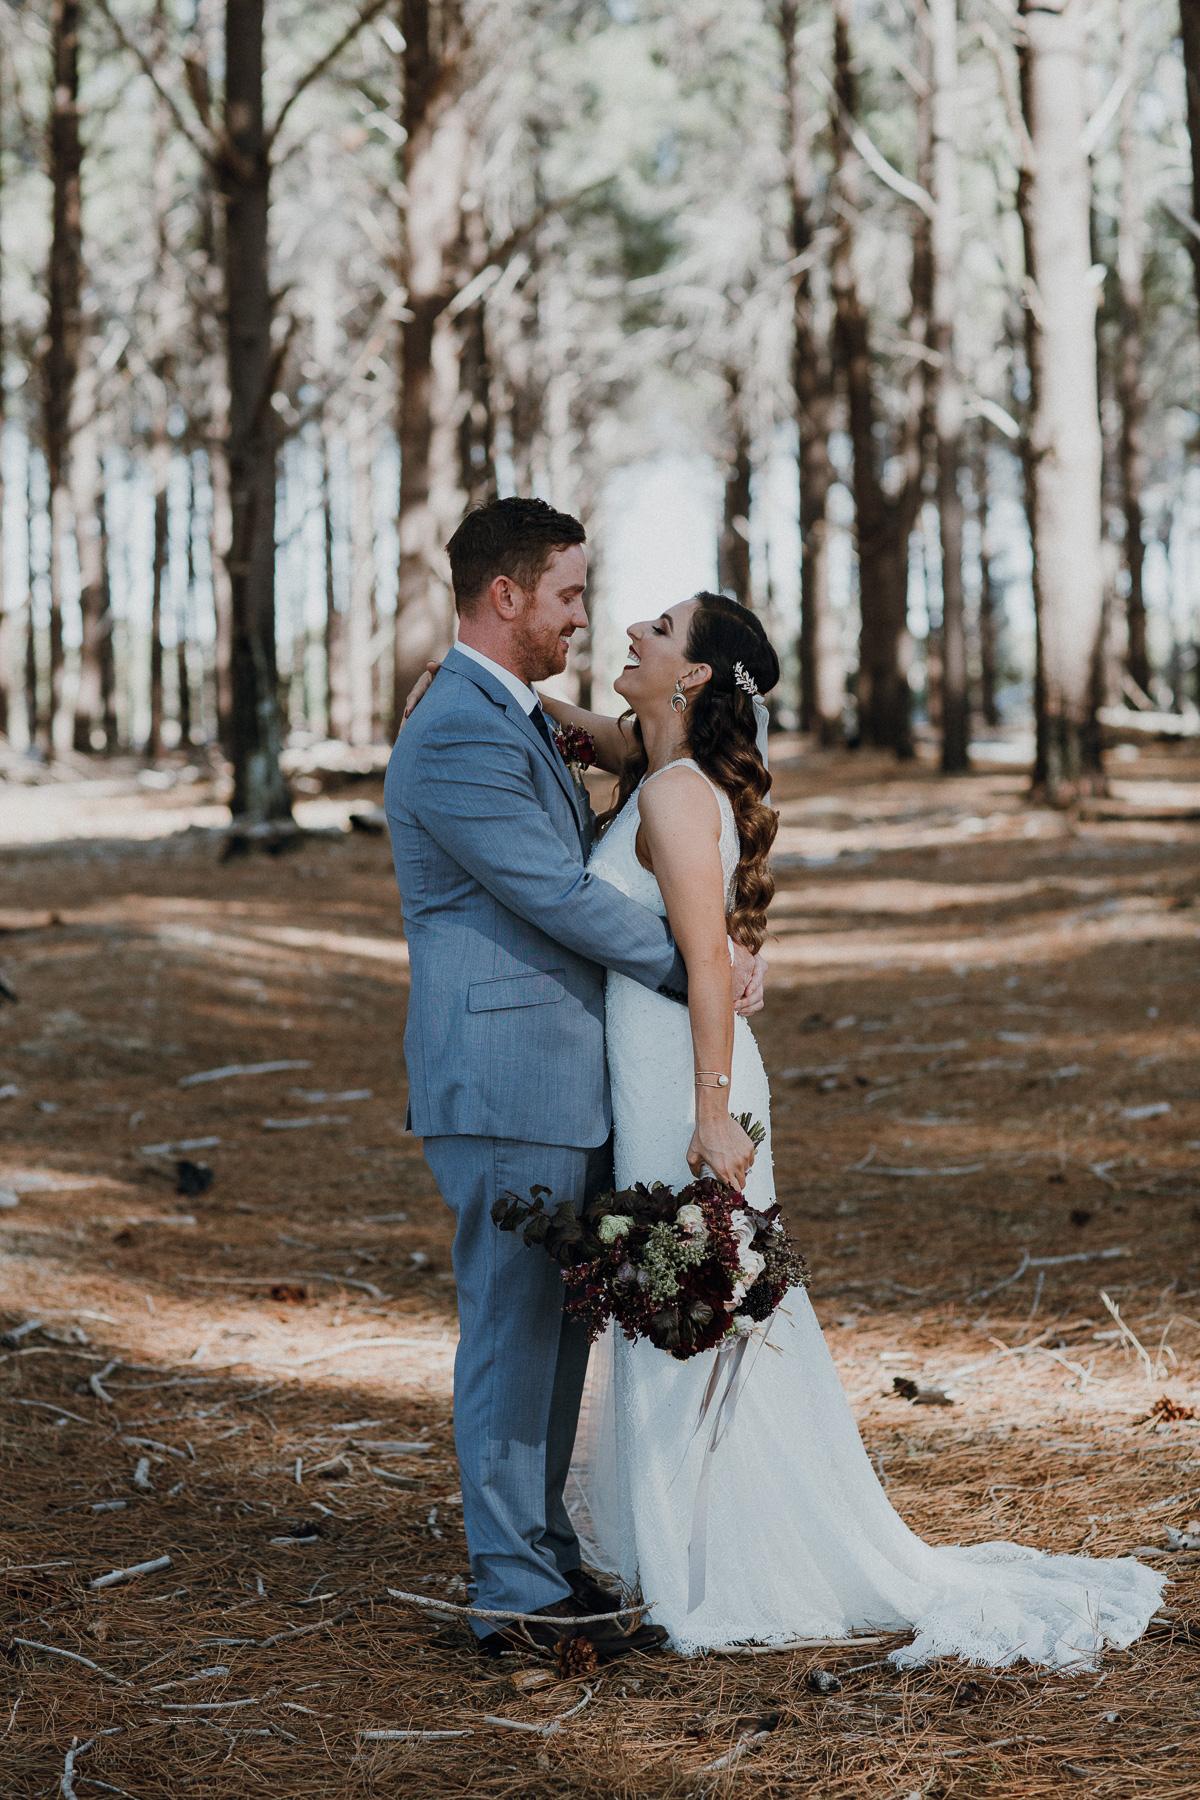 Peggy Saas-Perth Wedding Photographer-The Flour Factory Wedding-74.jpg